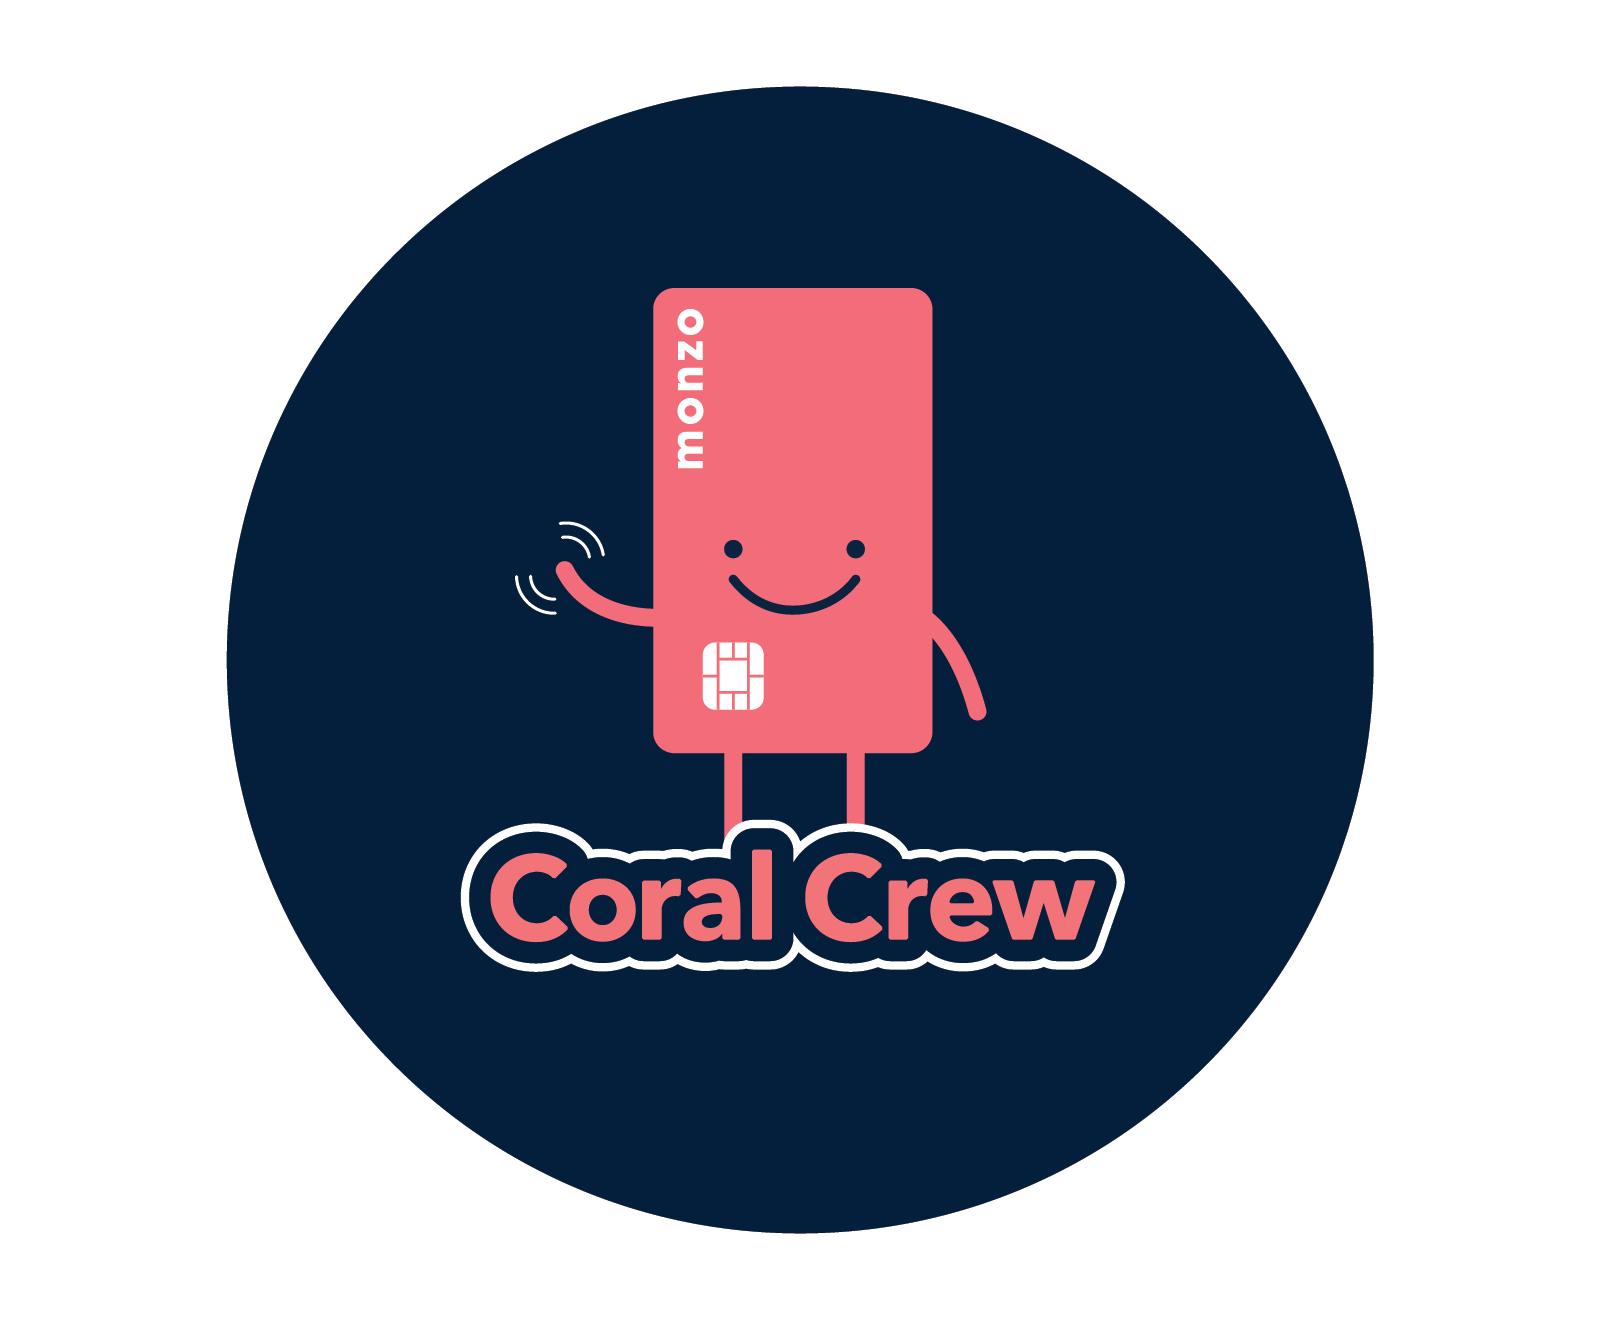 Illustration of Coral Crew logo